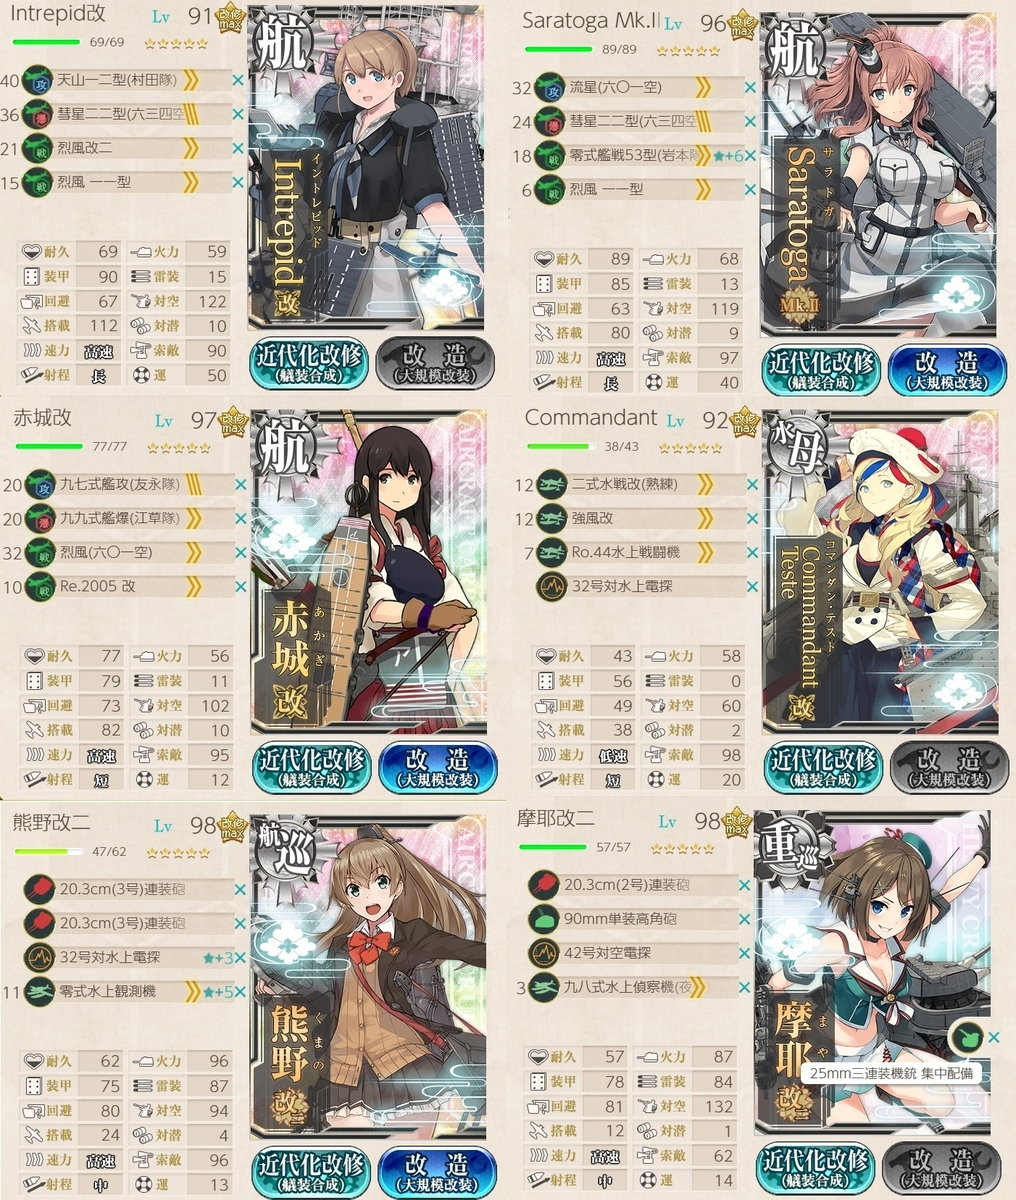 f:id:shironegu:20190614221706j:plain